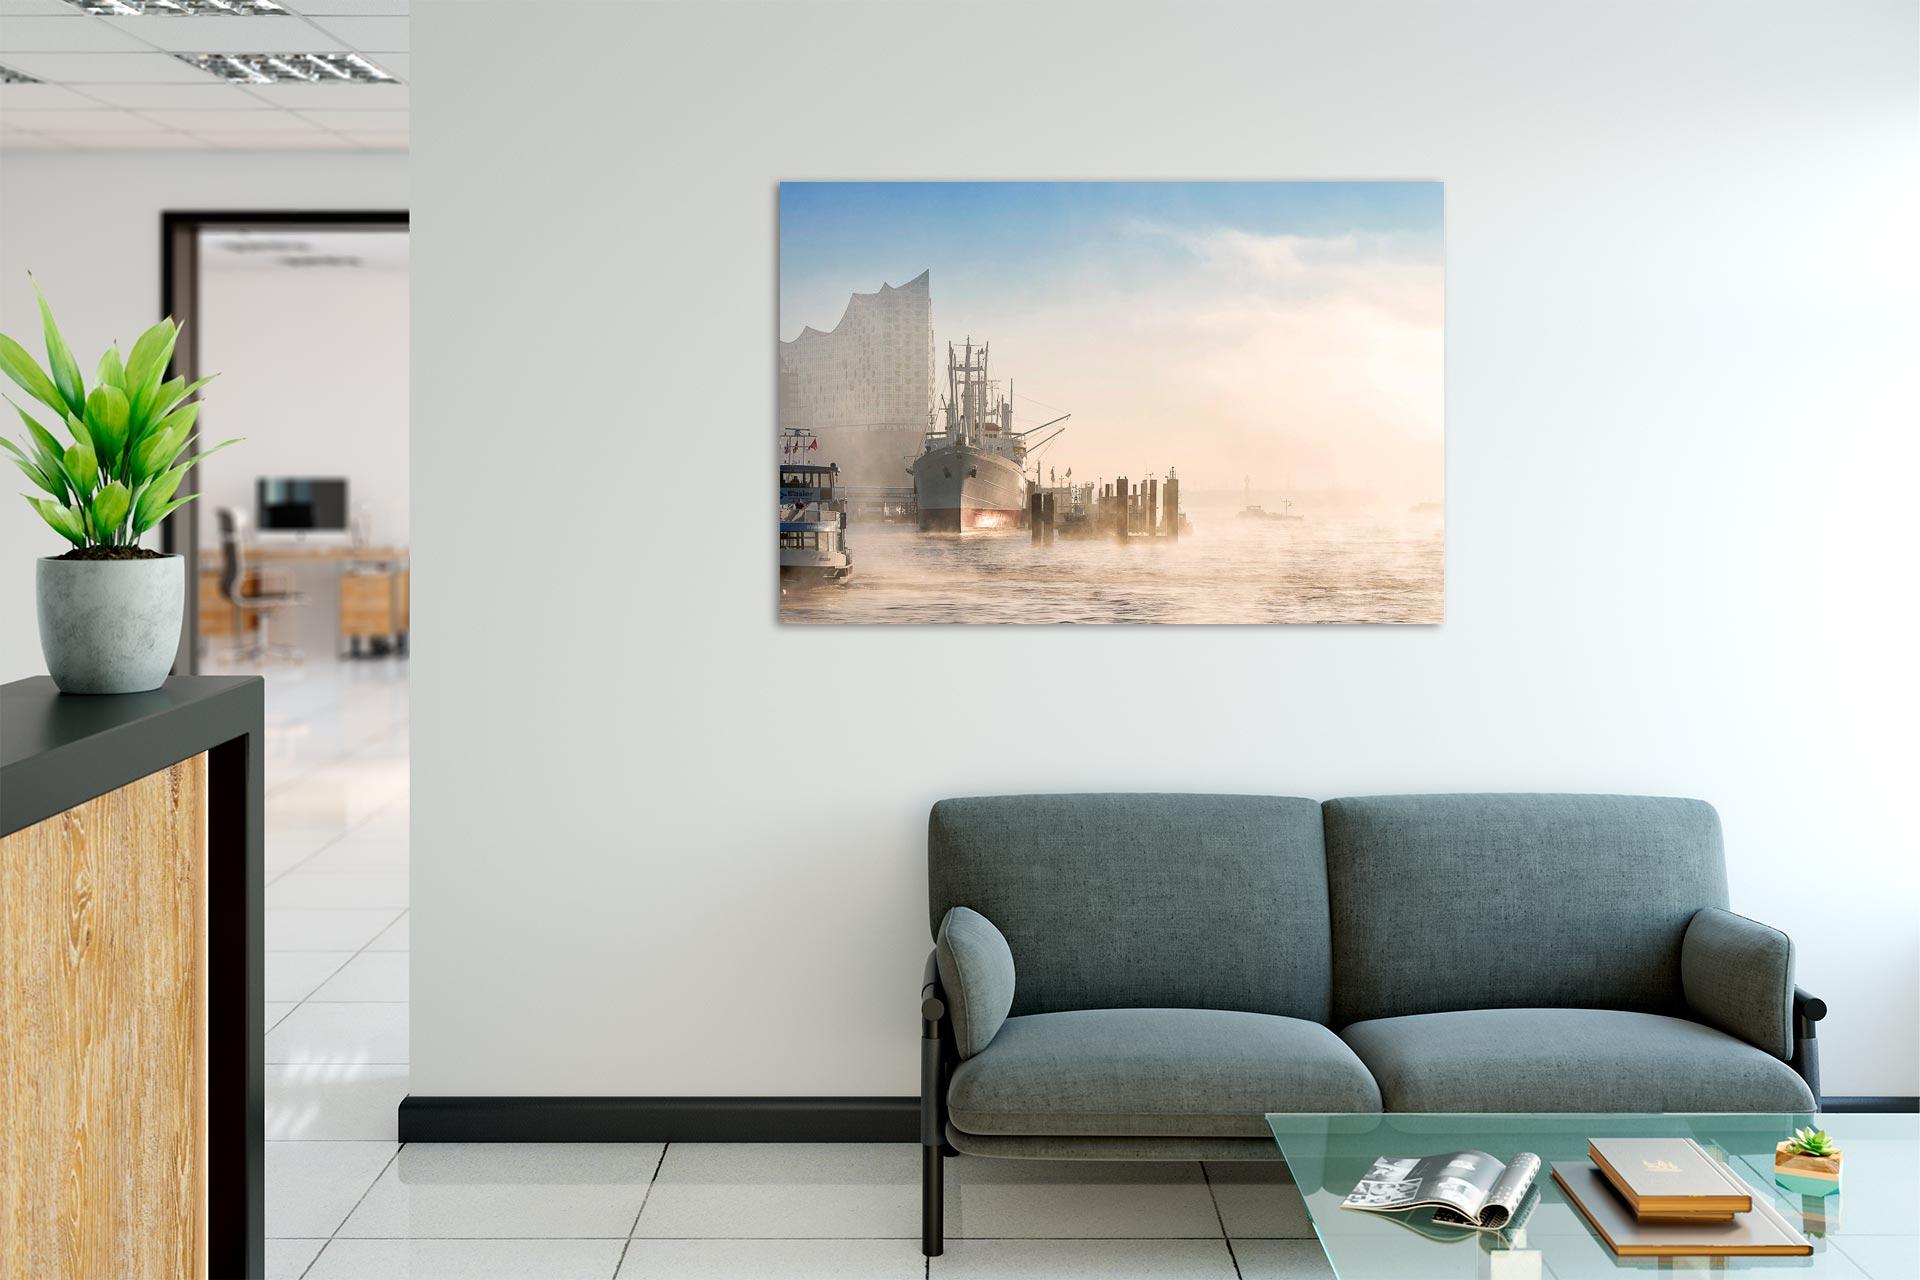 LCW247-elphi-im-nebel-hamburg-wandbild-bild-auf-leinwand-acrylglas-aludibond-empfang